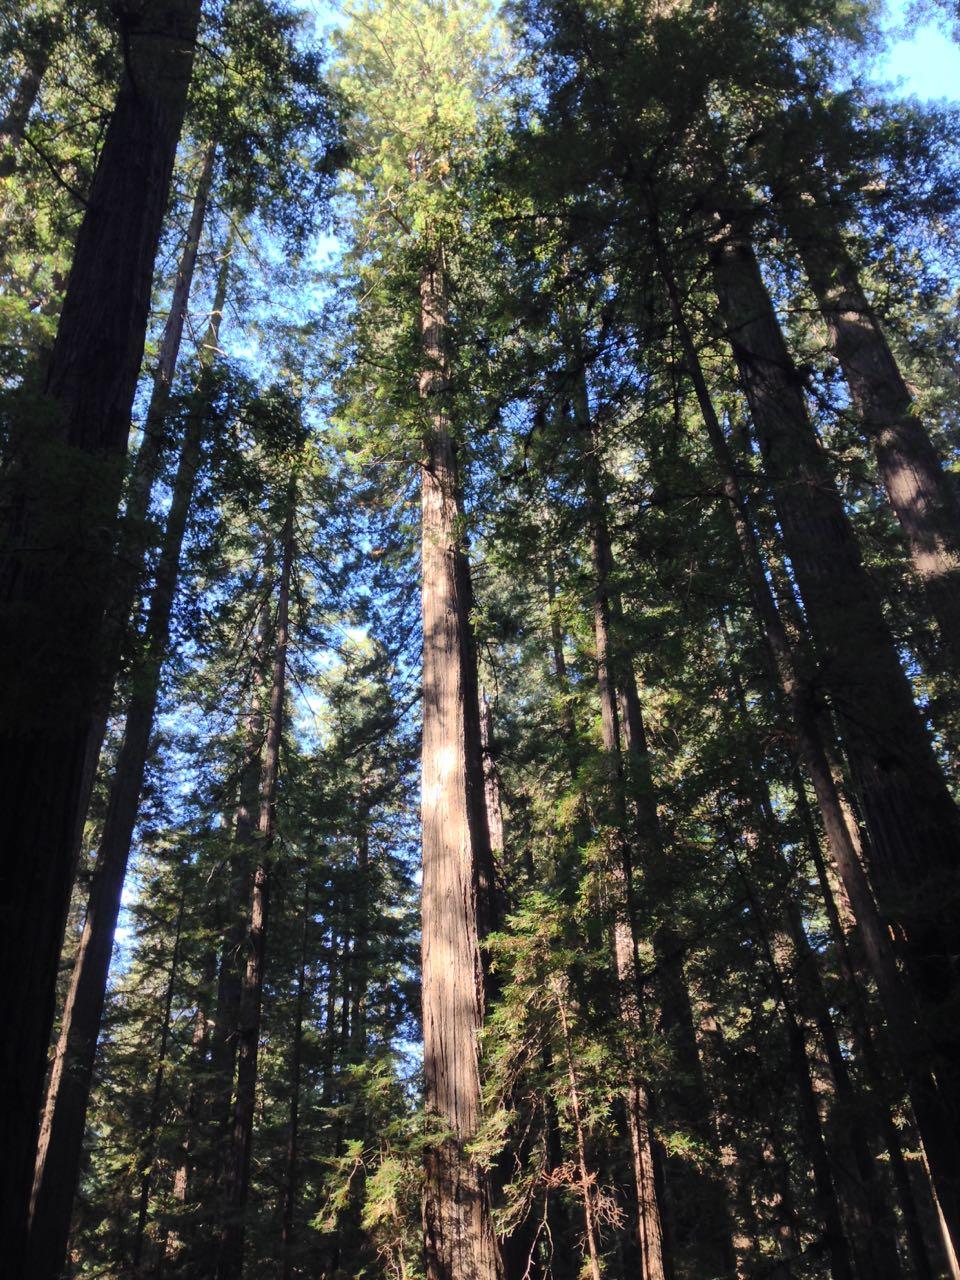 Redwoods 2017 10 01 18 Of 244